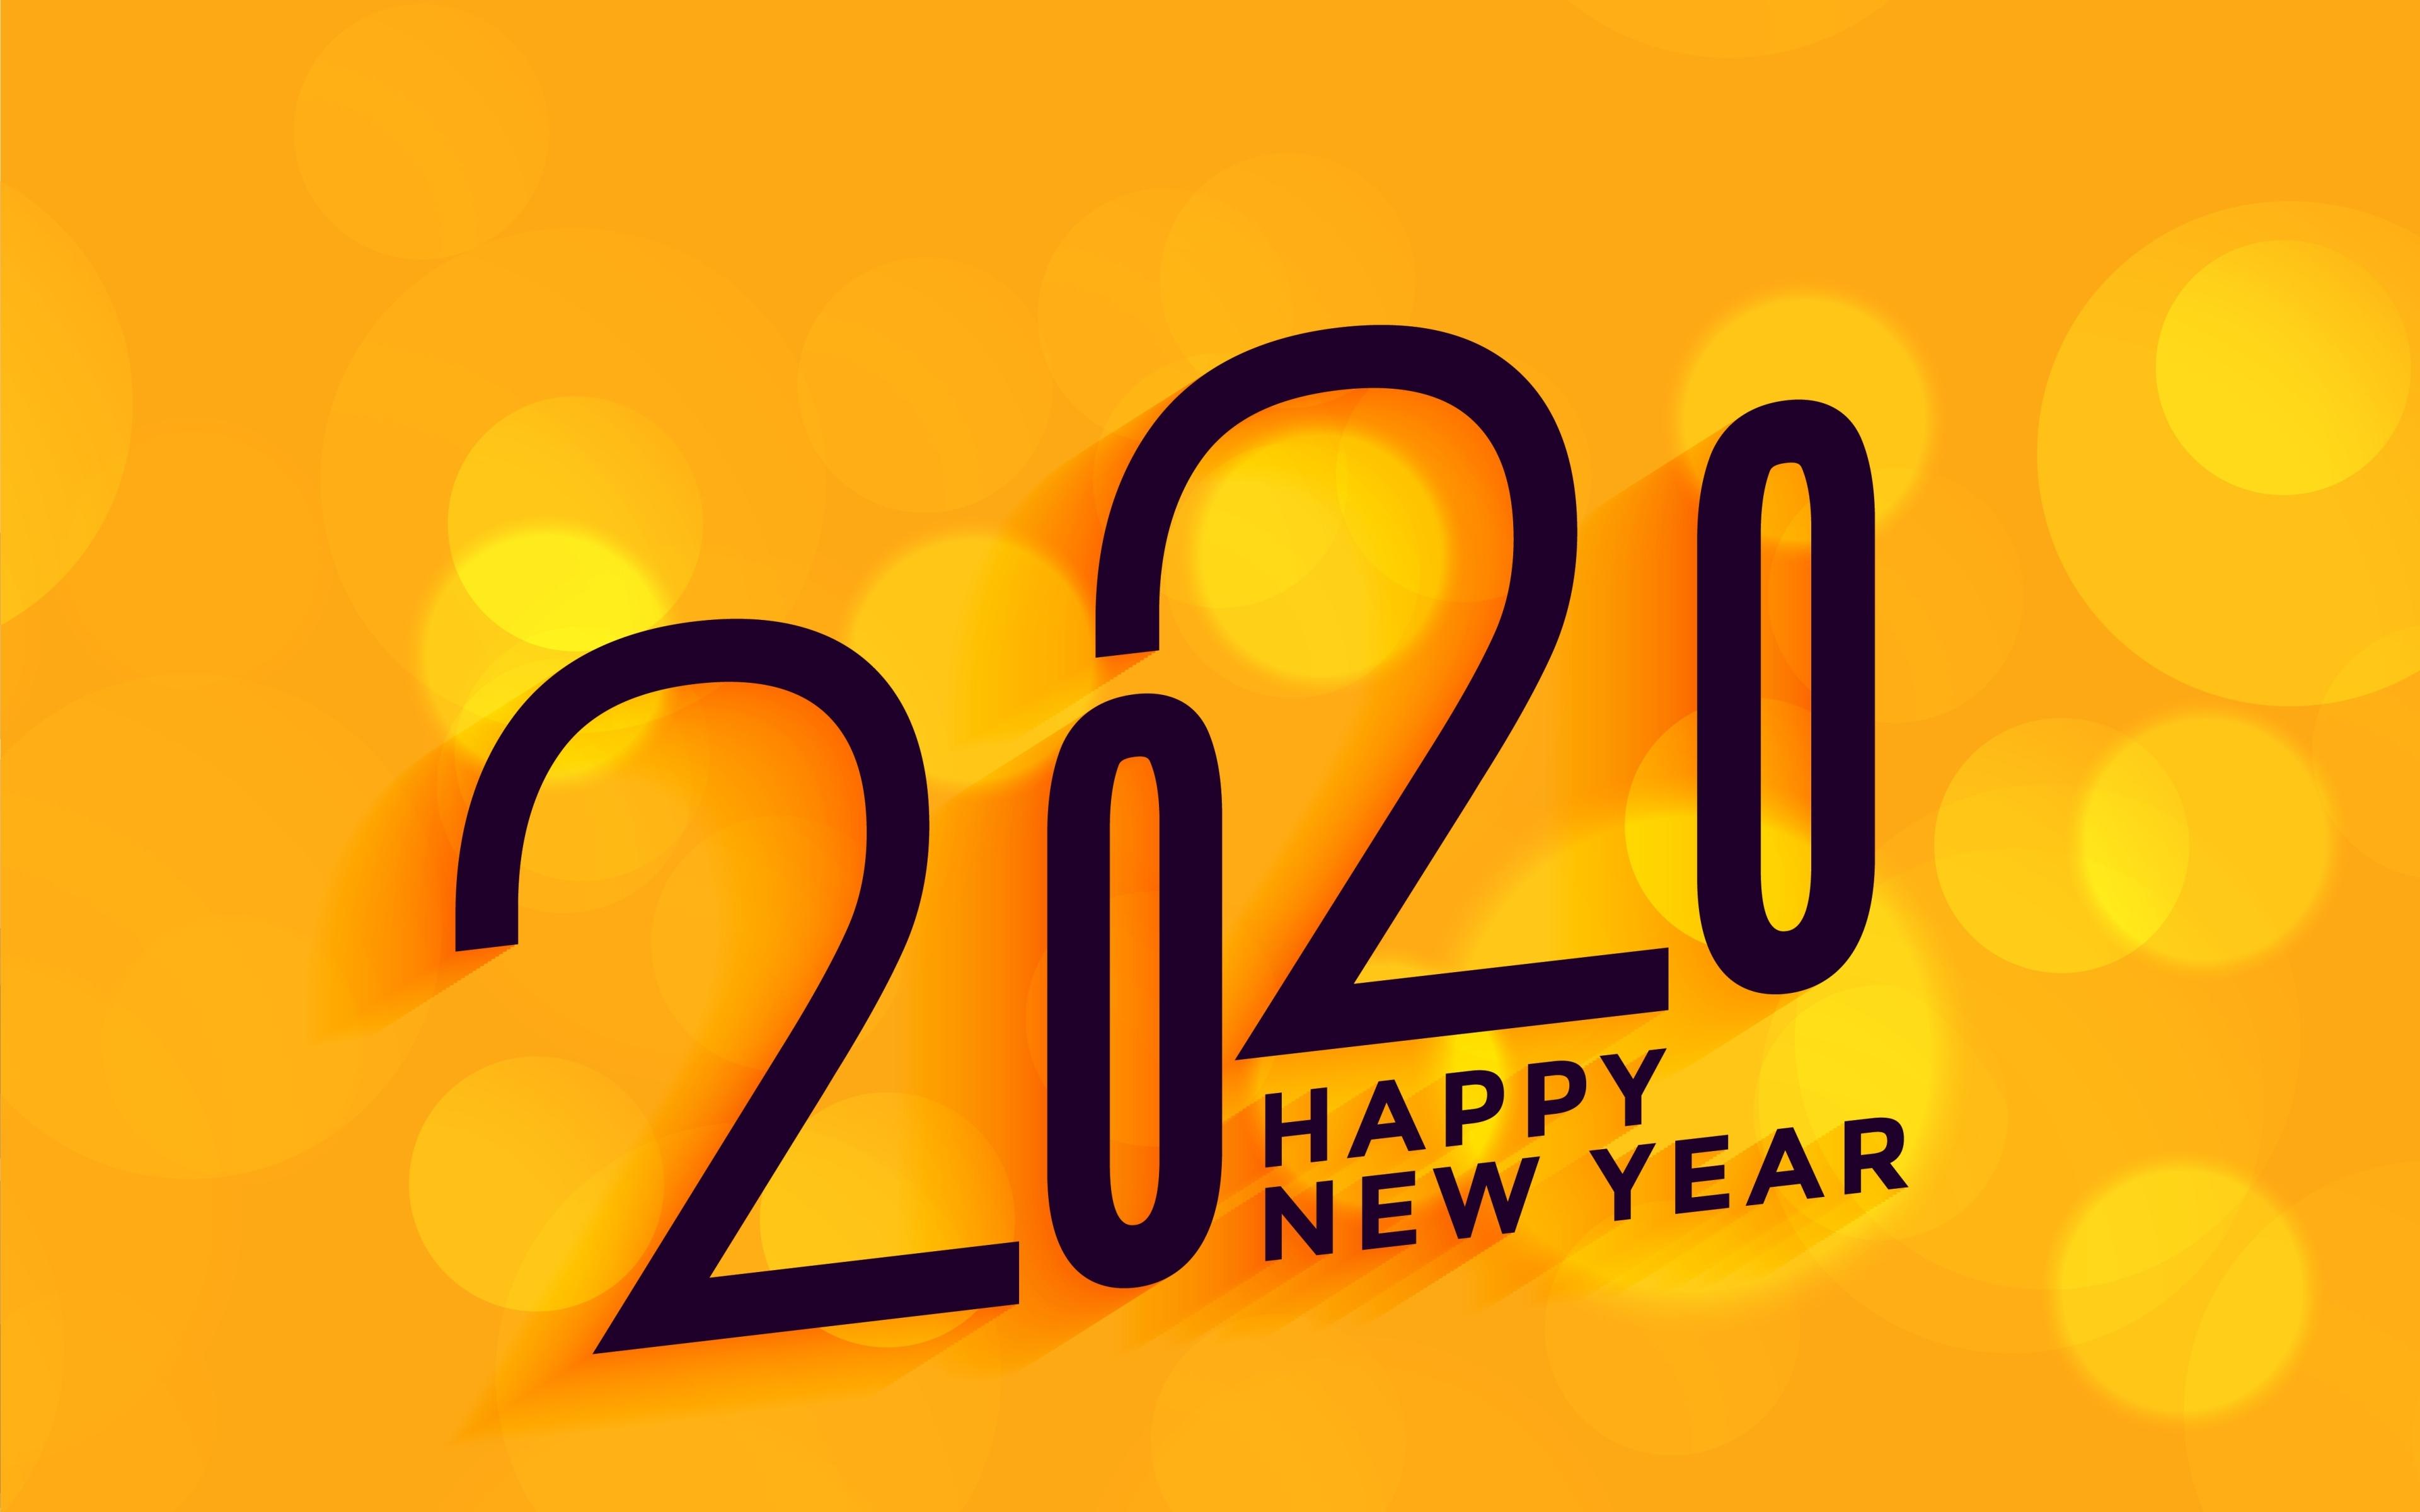 3840x2400 2020 New Year 4k 3840x2400 Resolution Wallpaper